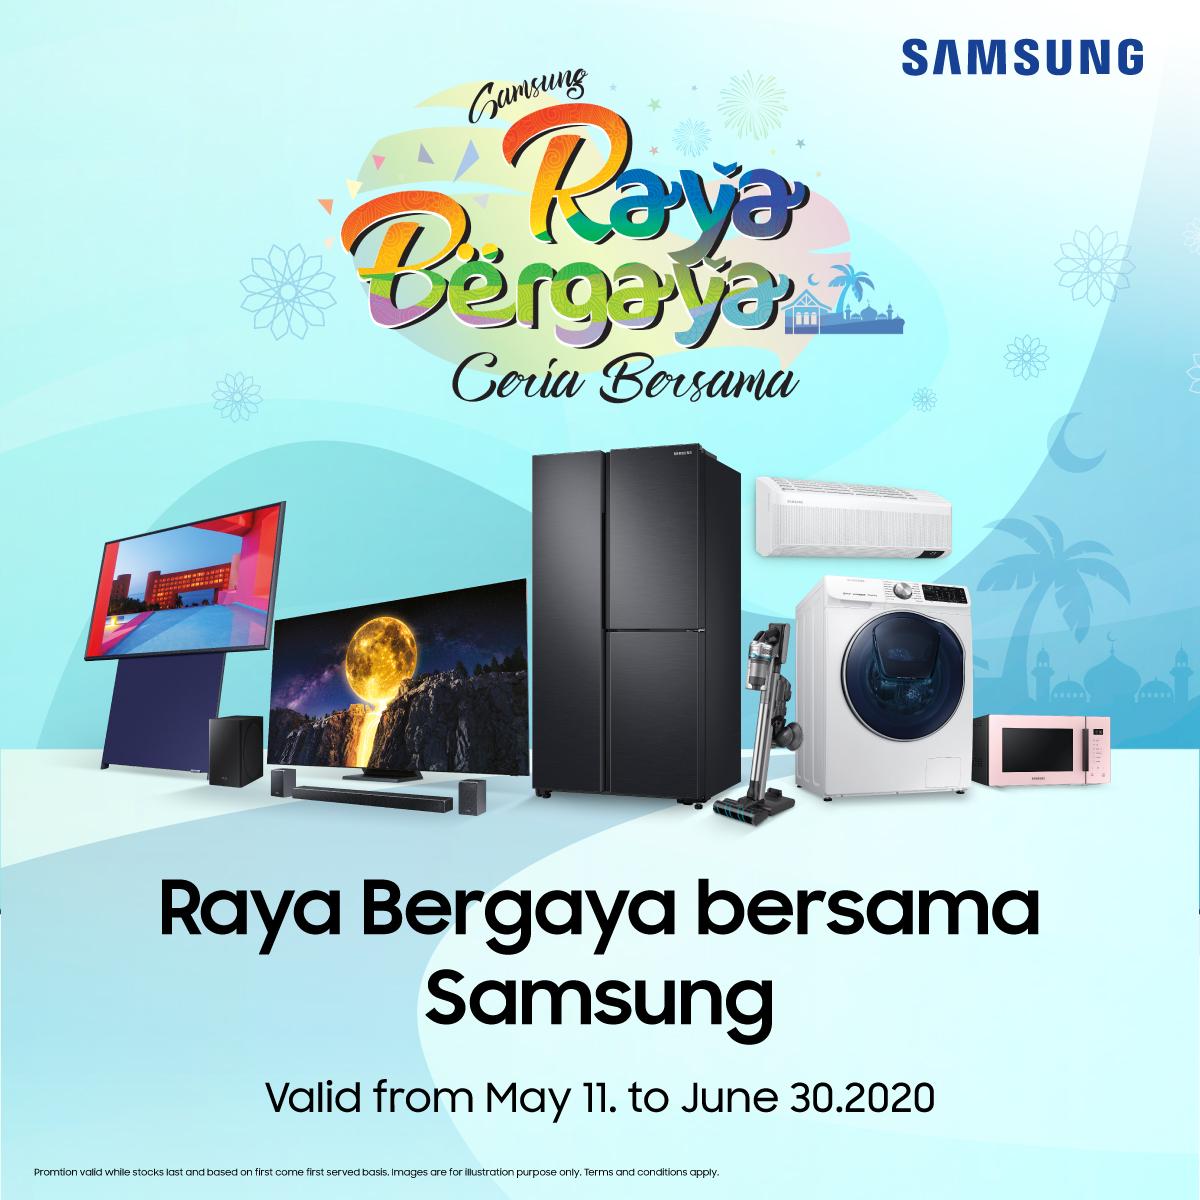 Raya Bergaya with Samsung Malaysia